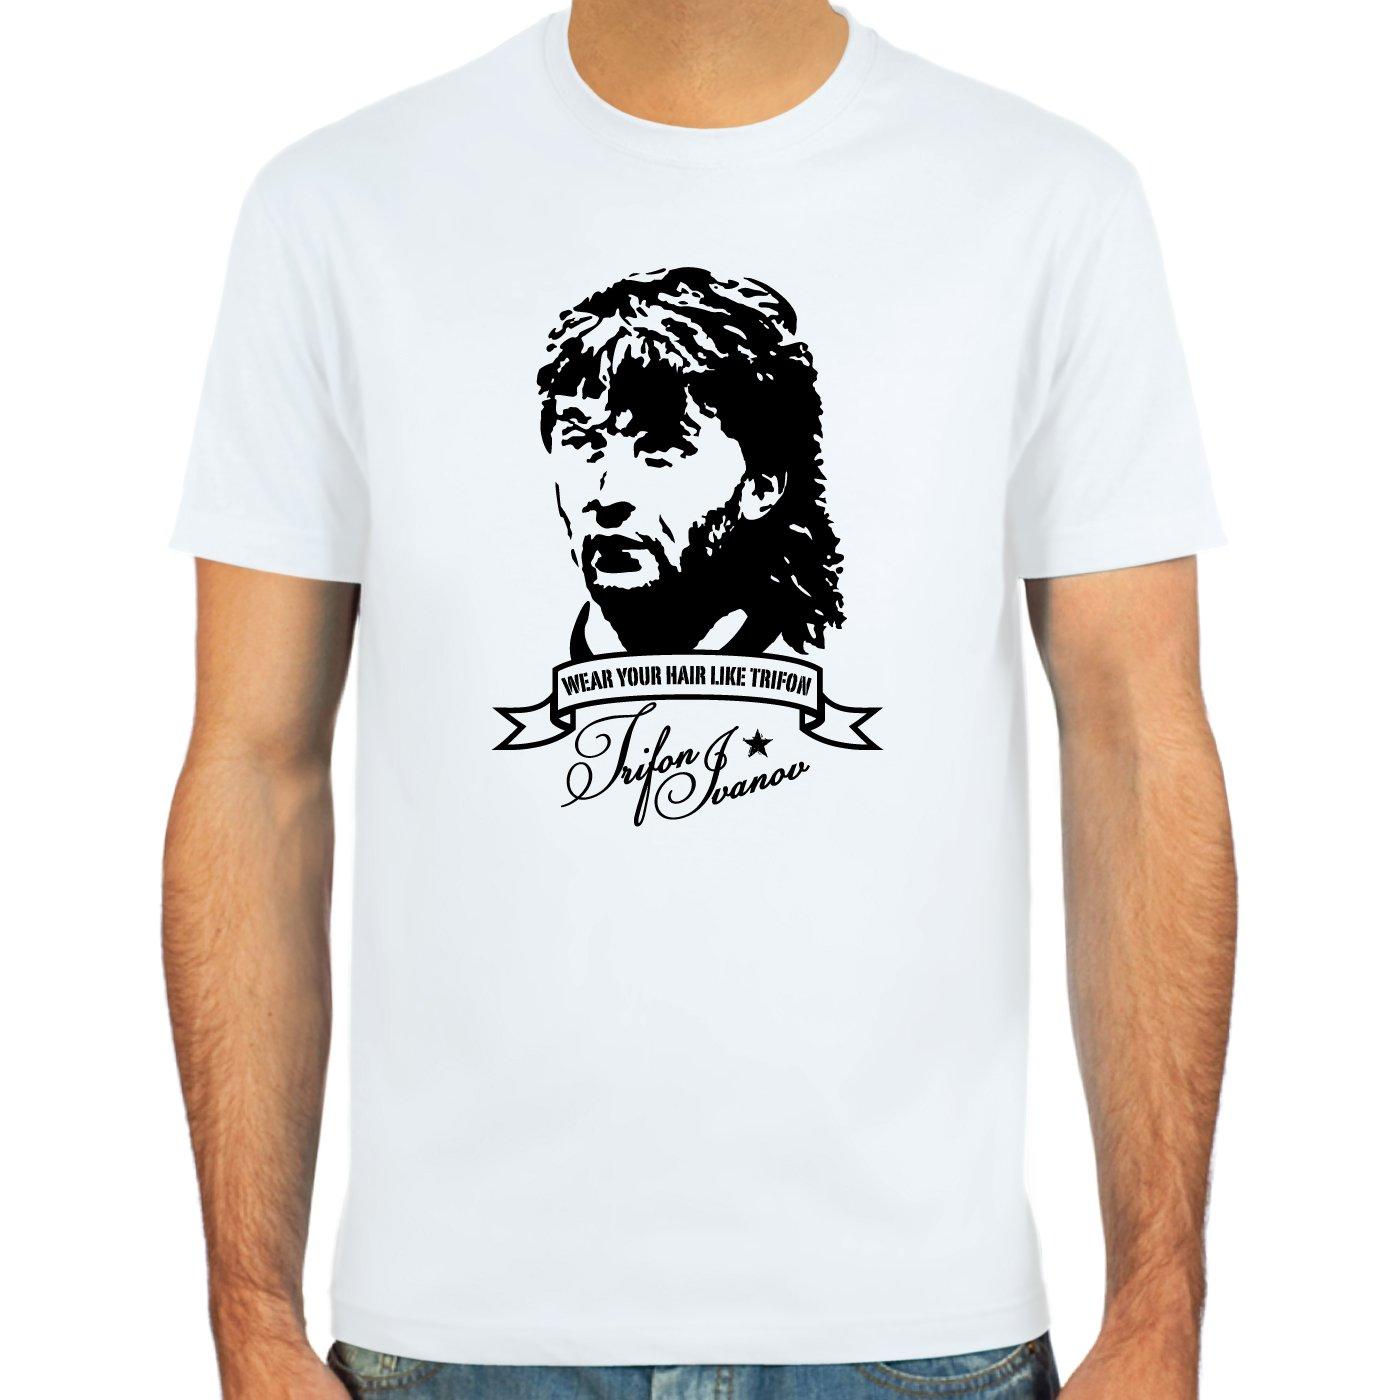 SpielRaum T-Shirt Trifon Vokuhila Ivanov wei/ß oder deepred : S-XXL : Farbauswahl : sand Fu/ßball-Kult Gr/ö/ßen skyblue